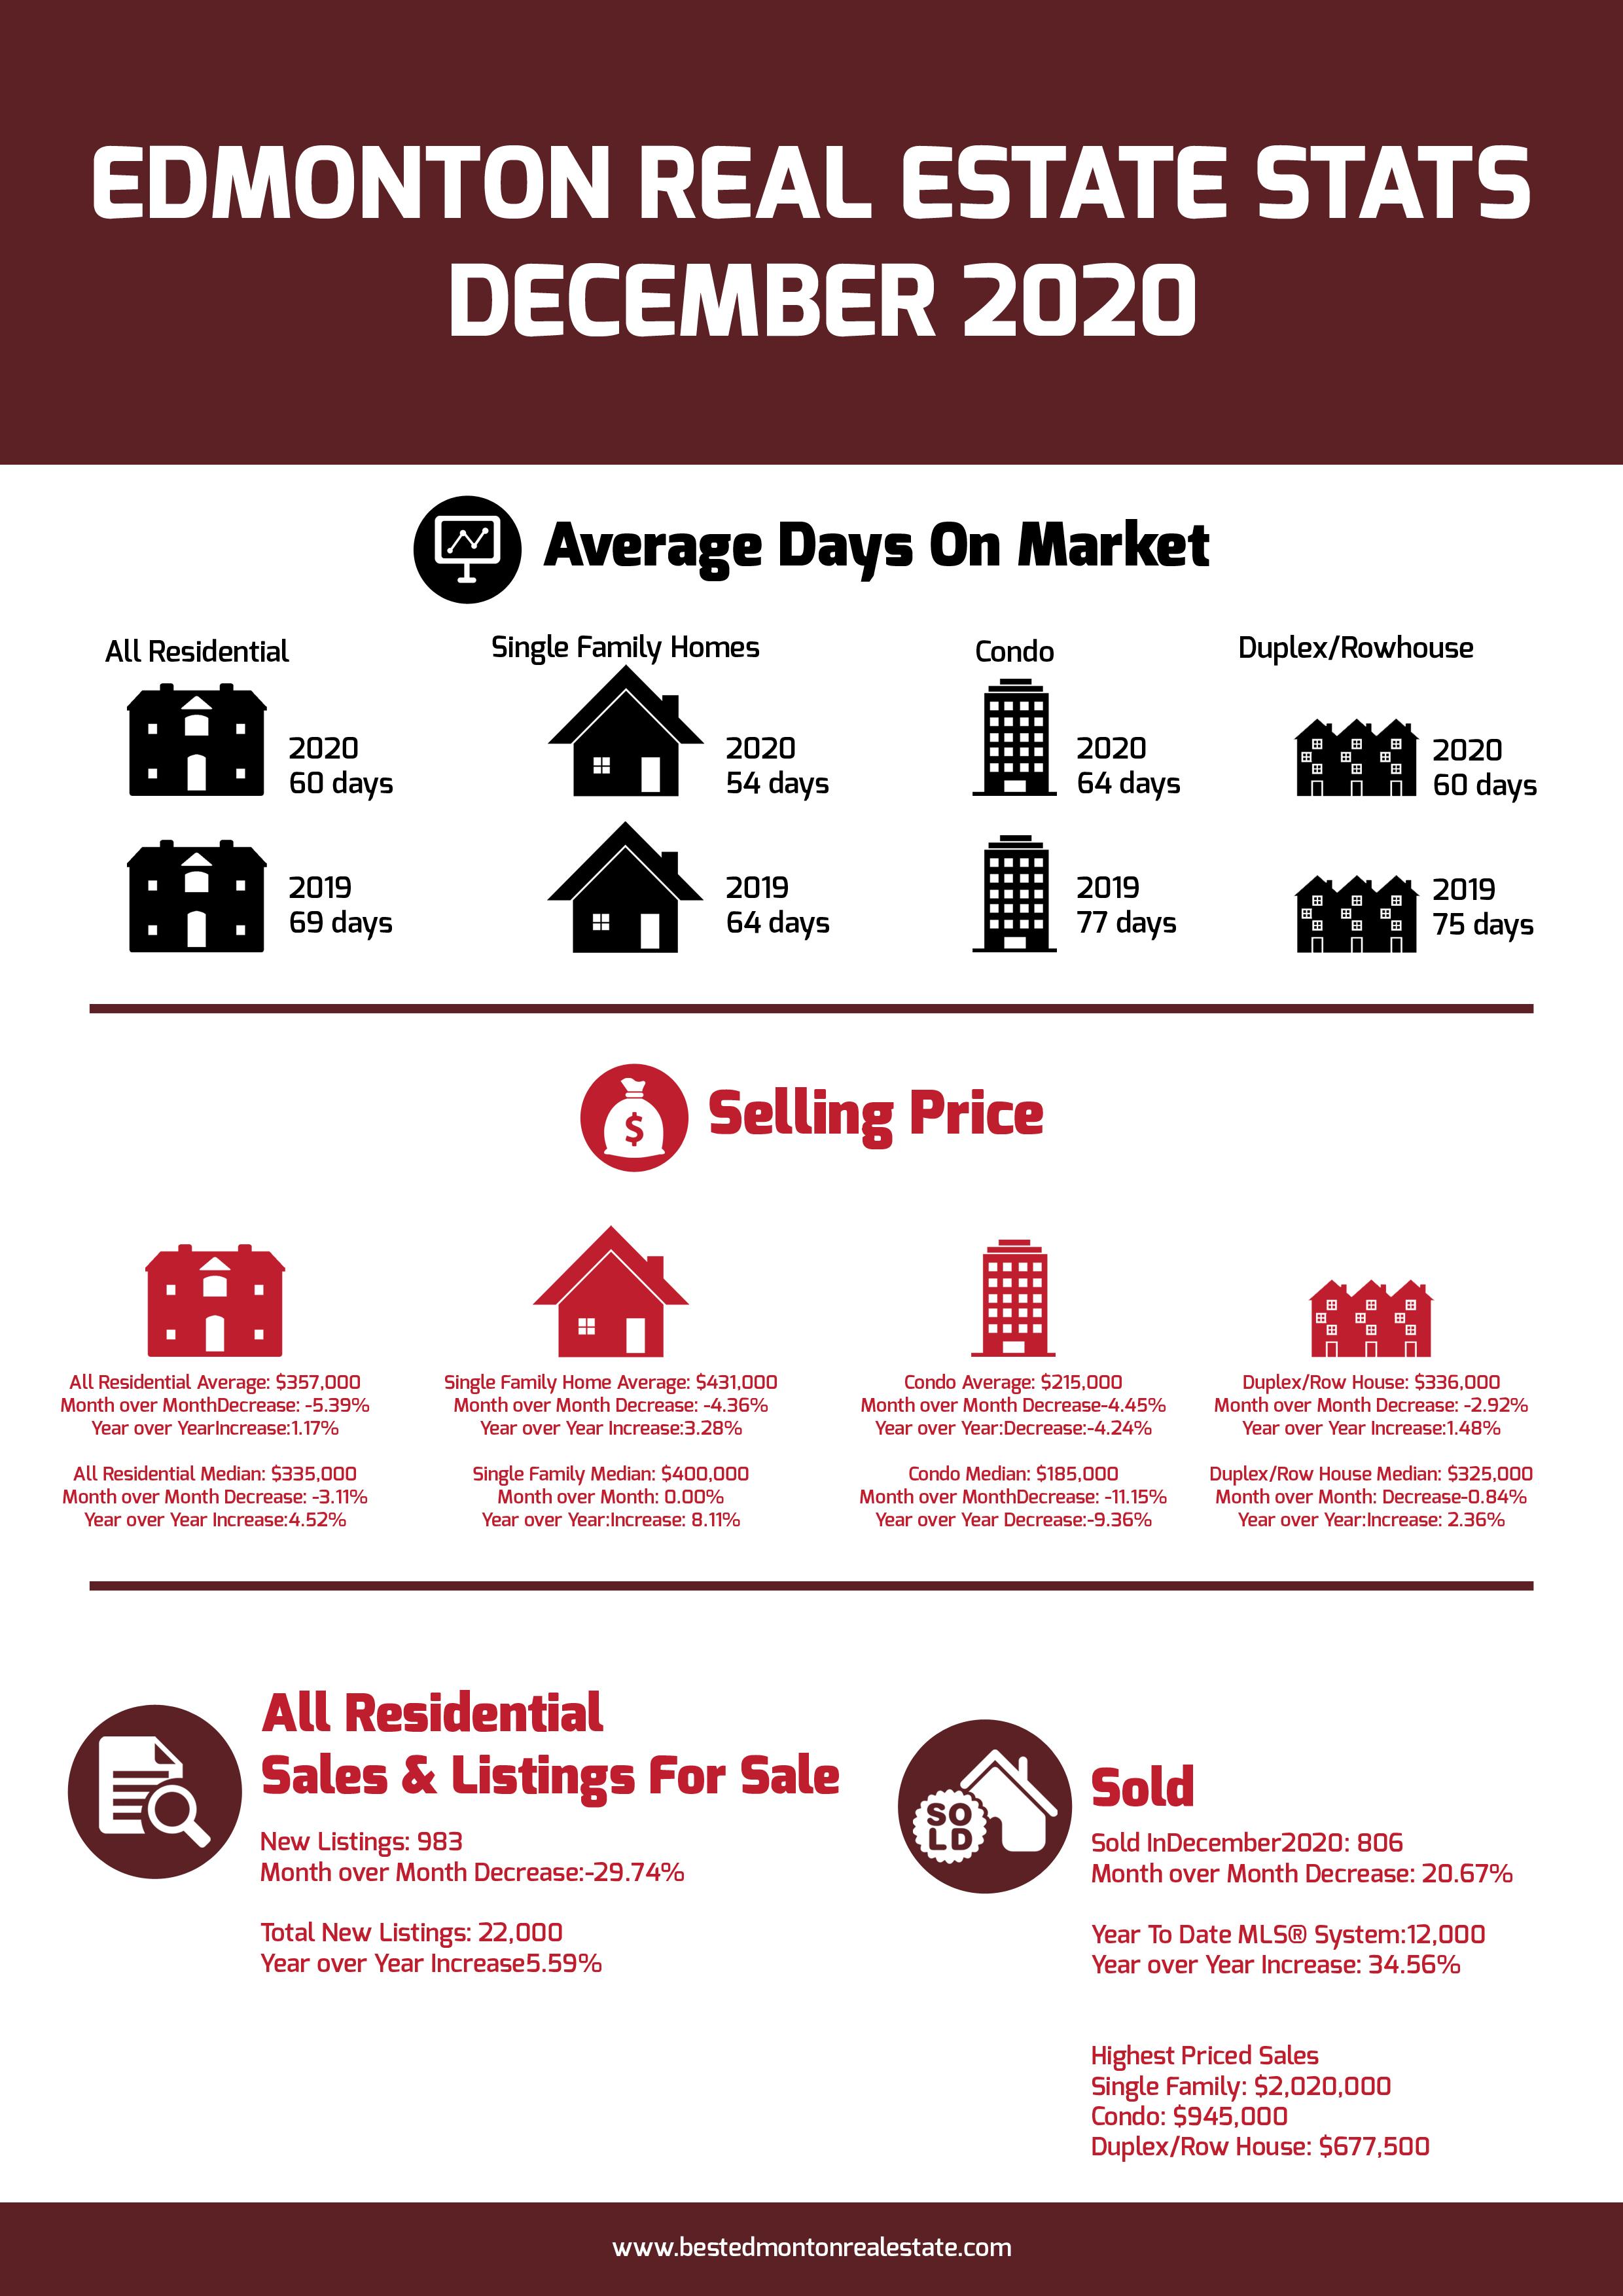 Edmonton Real Estate Stats December 2020